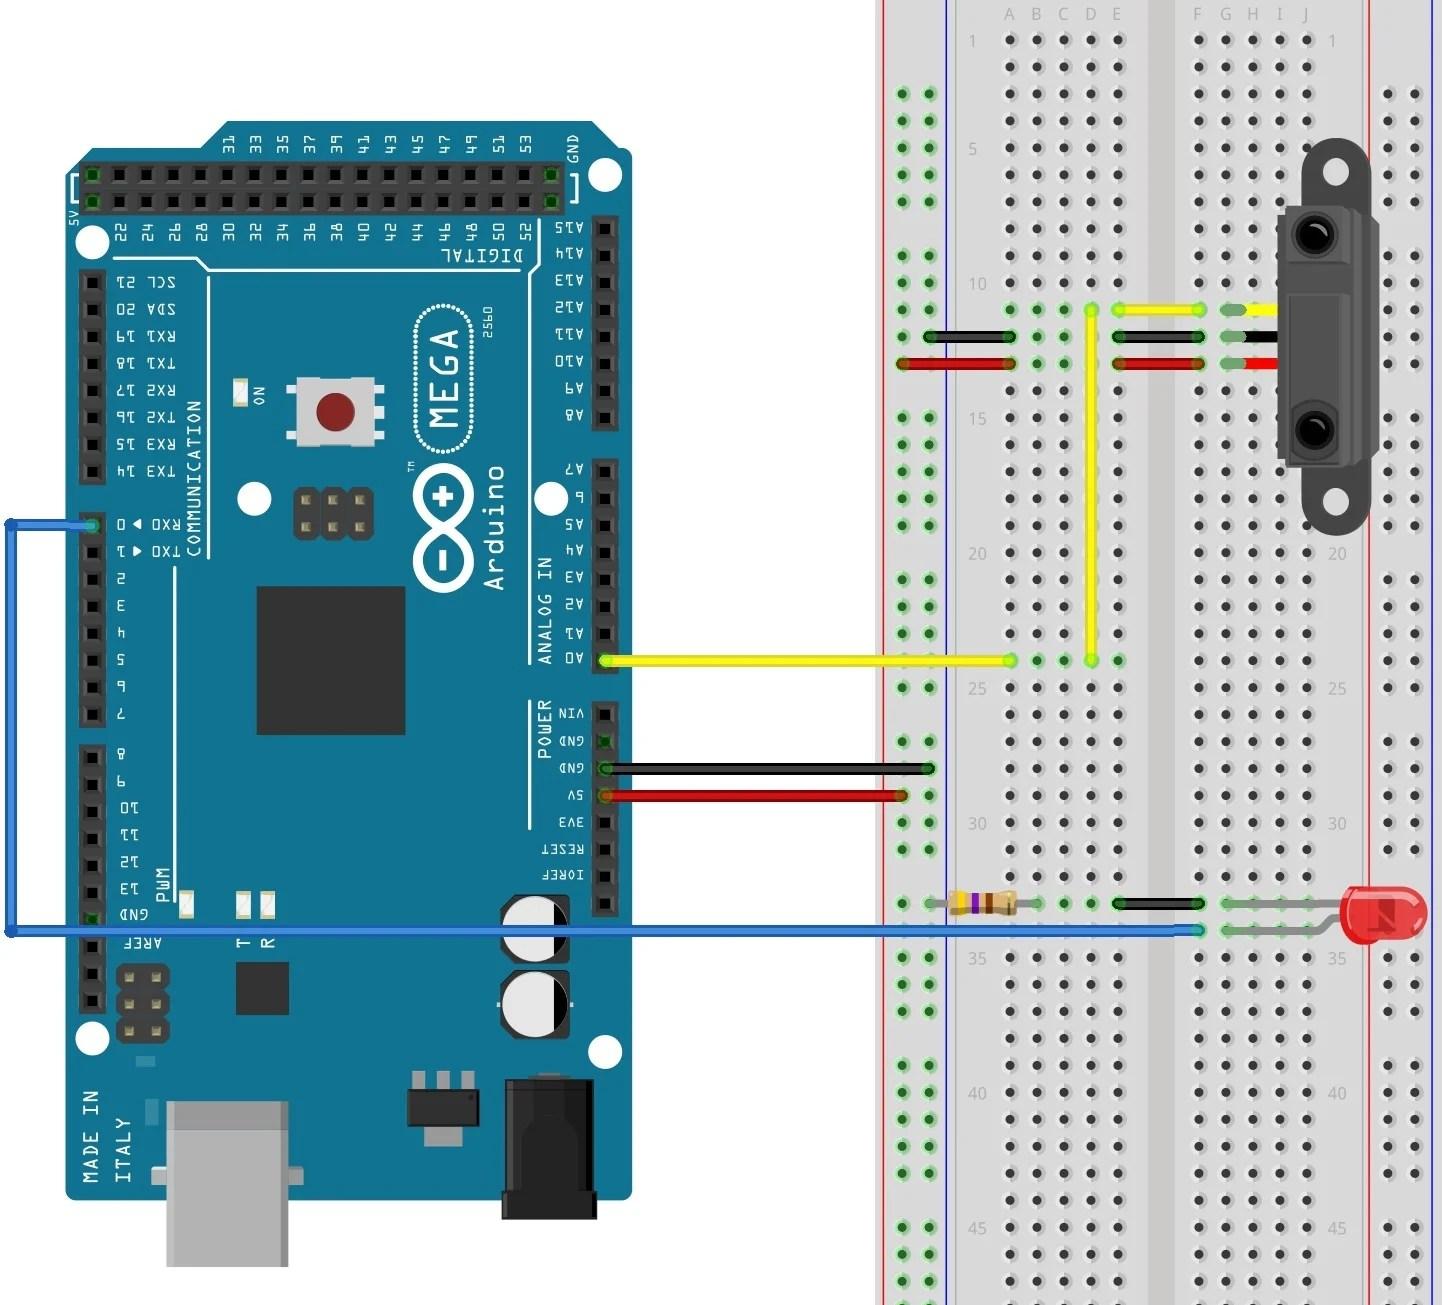 inductive proximity sensor wiring diagram pinout wiring diagraminductive proximity sensor wiring diagram pinout wiring librarycircuit diagram [ 1442 x 1305 Pixel ]